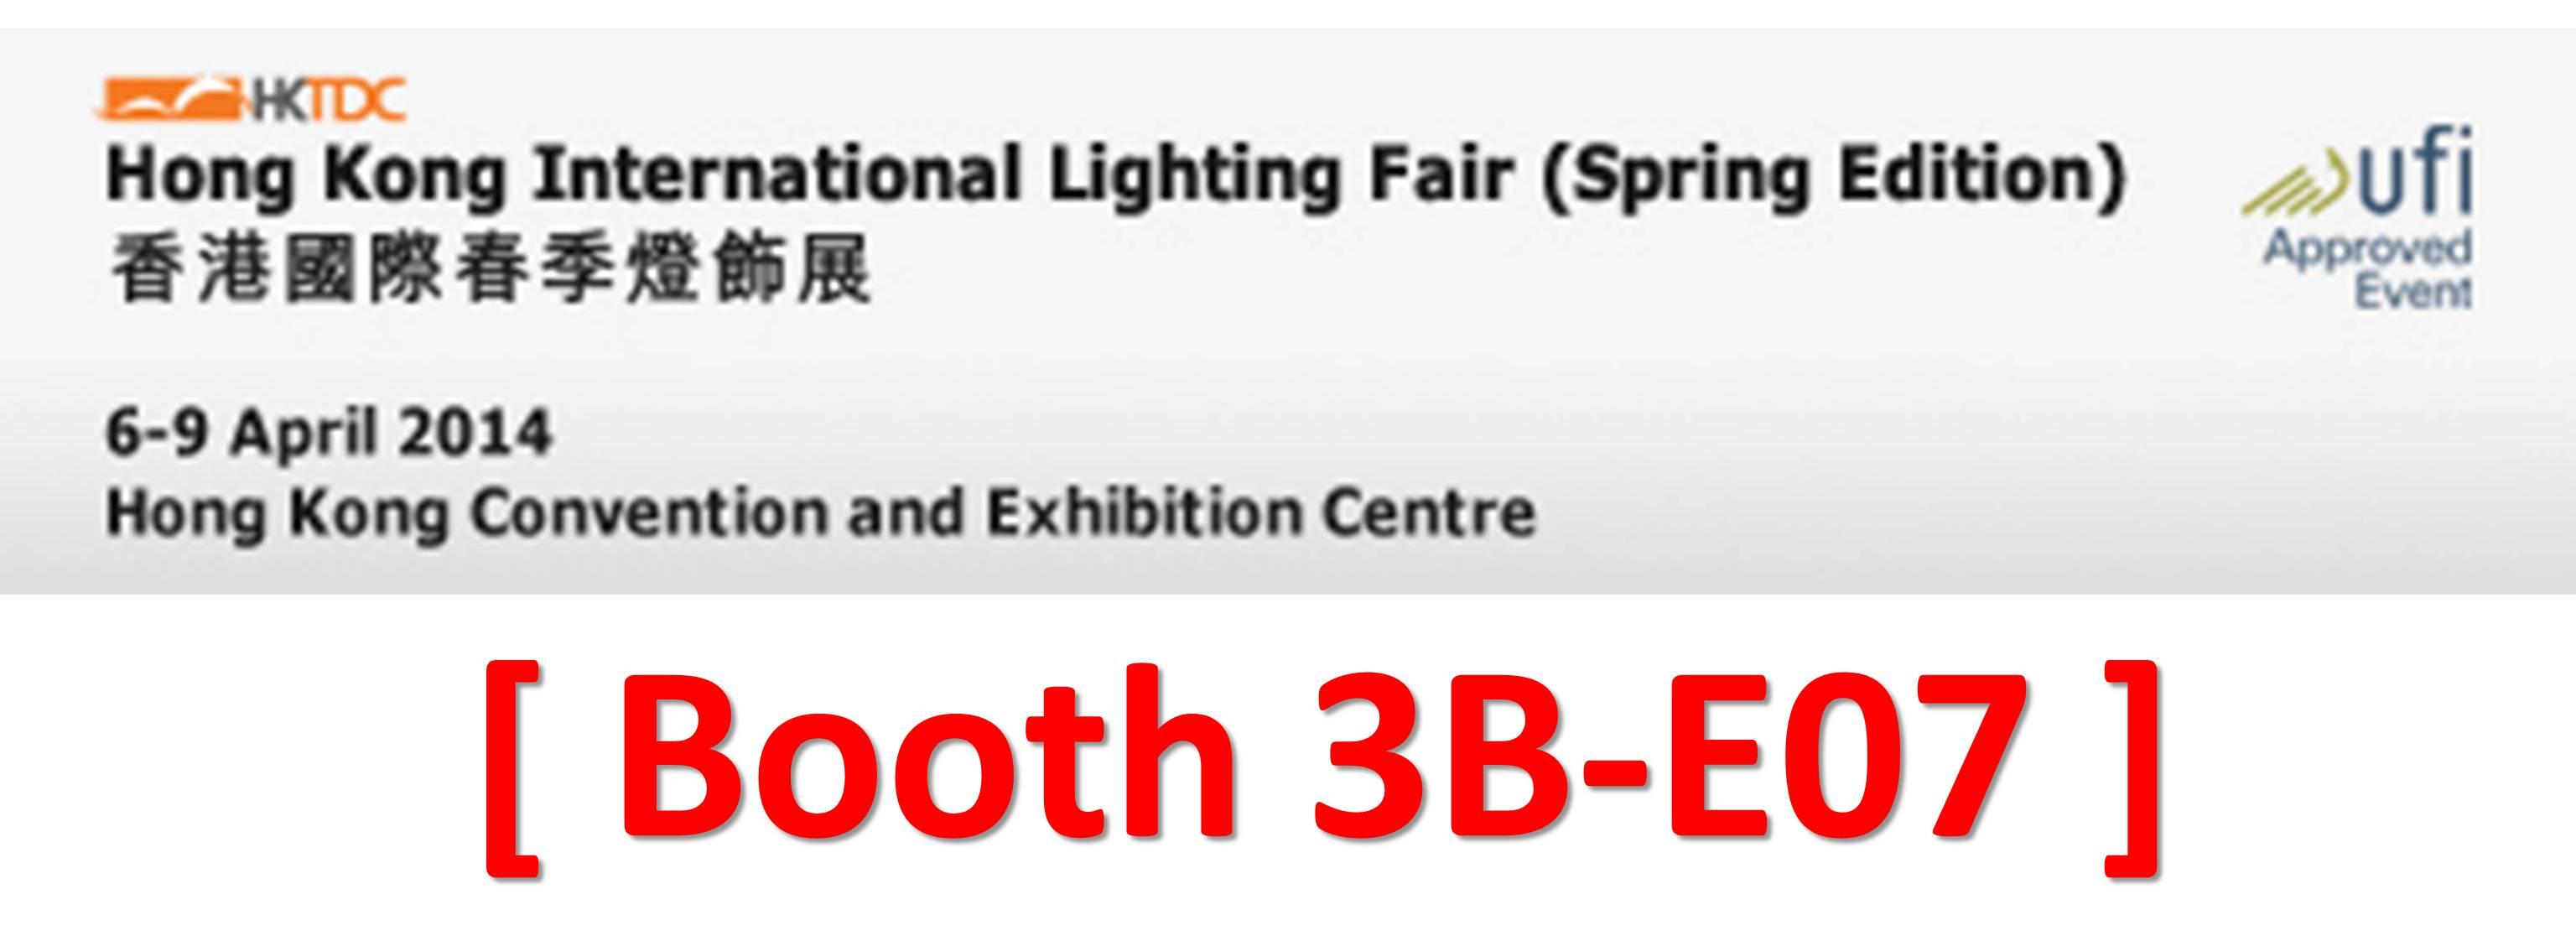 liseng technology ltd 利成科技有限公司 please visit us at booth